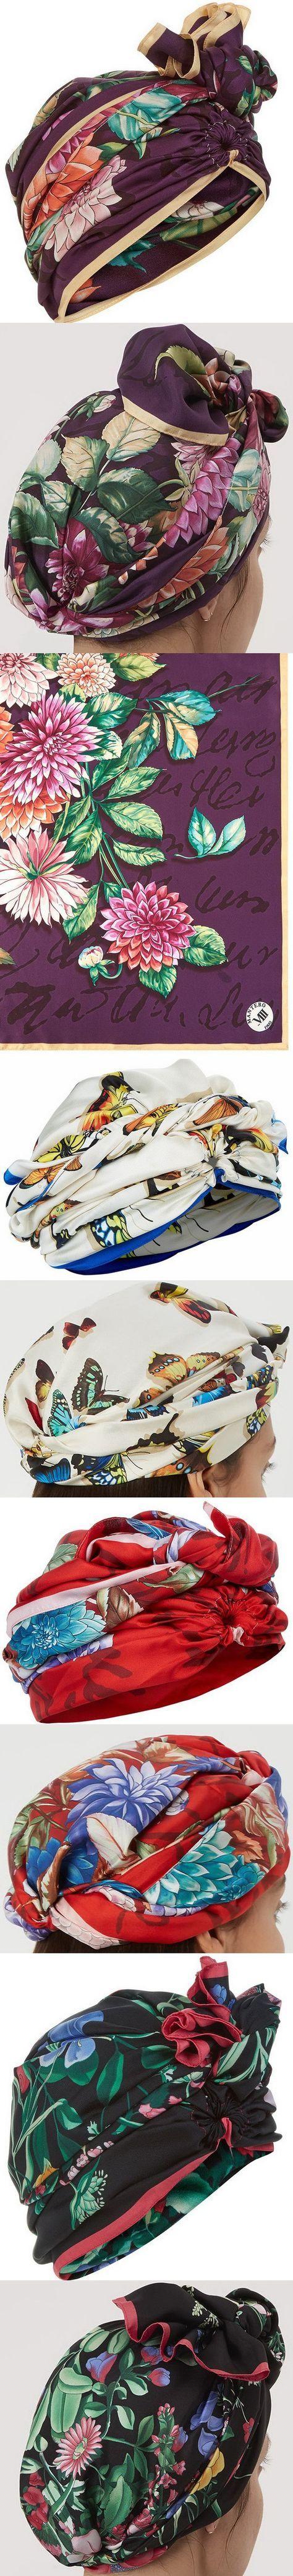 Тюрбаны с платков Dee Di Vita's silk headscarves are a vibrant accessory for holiday wardrobes.